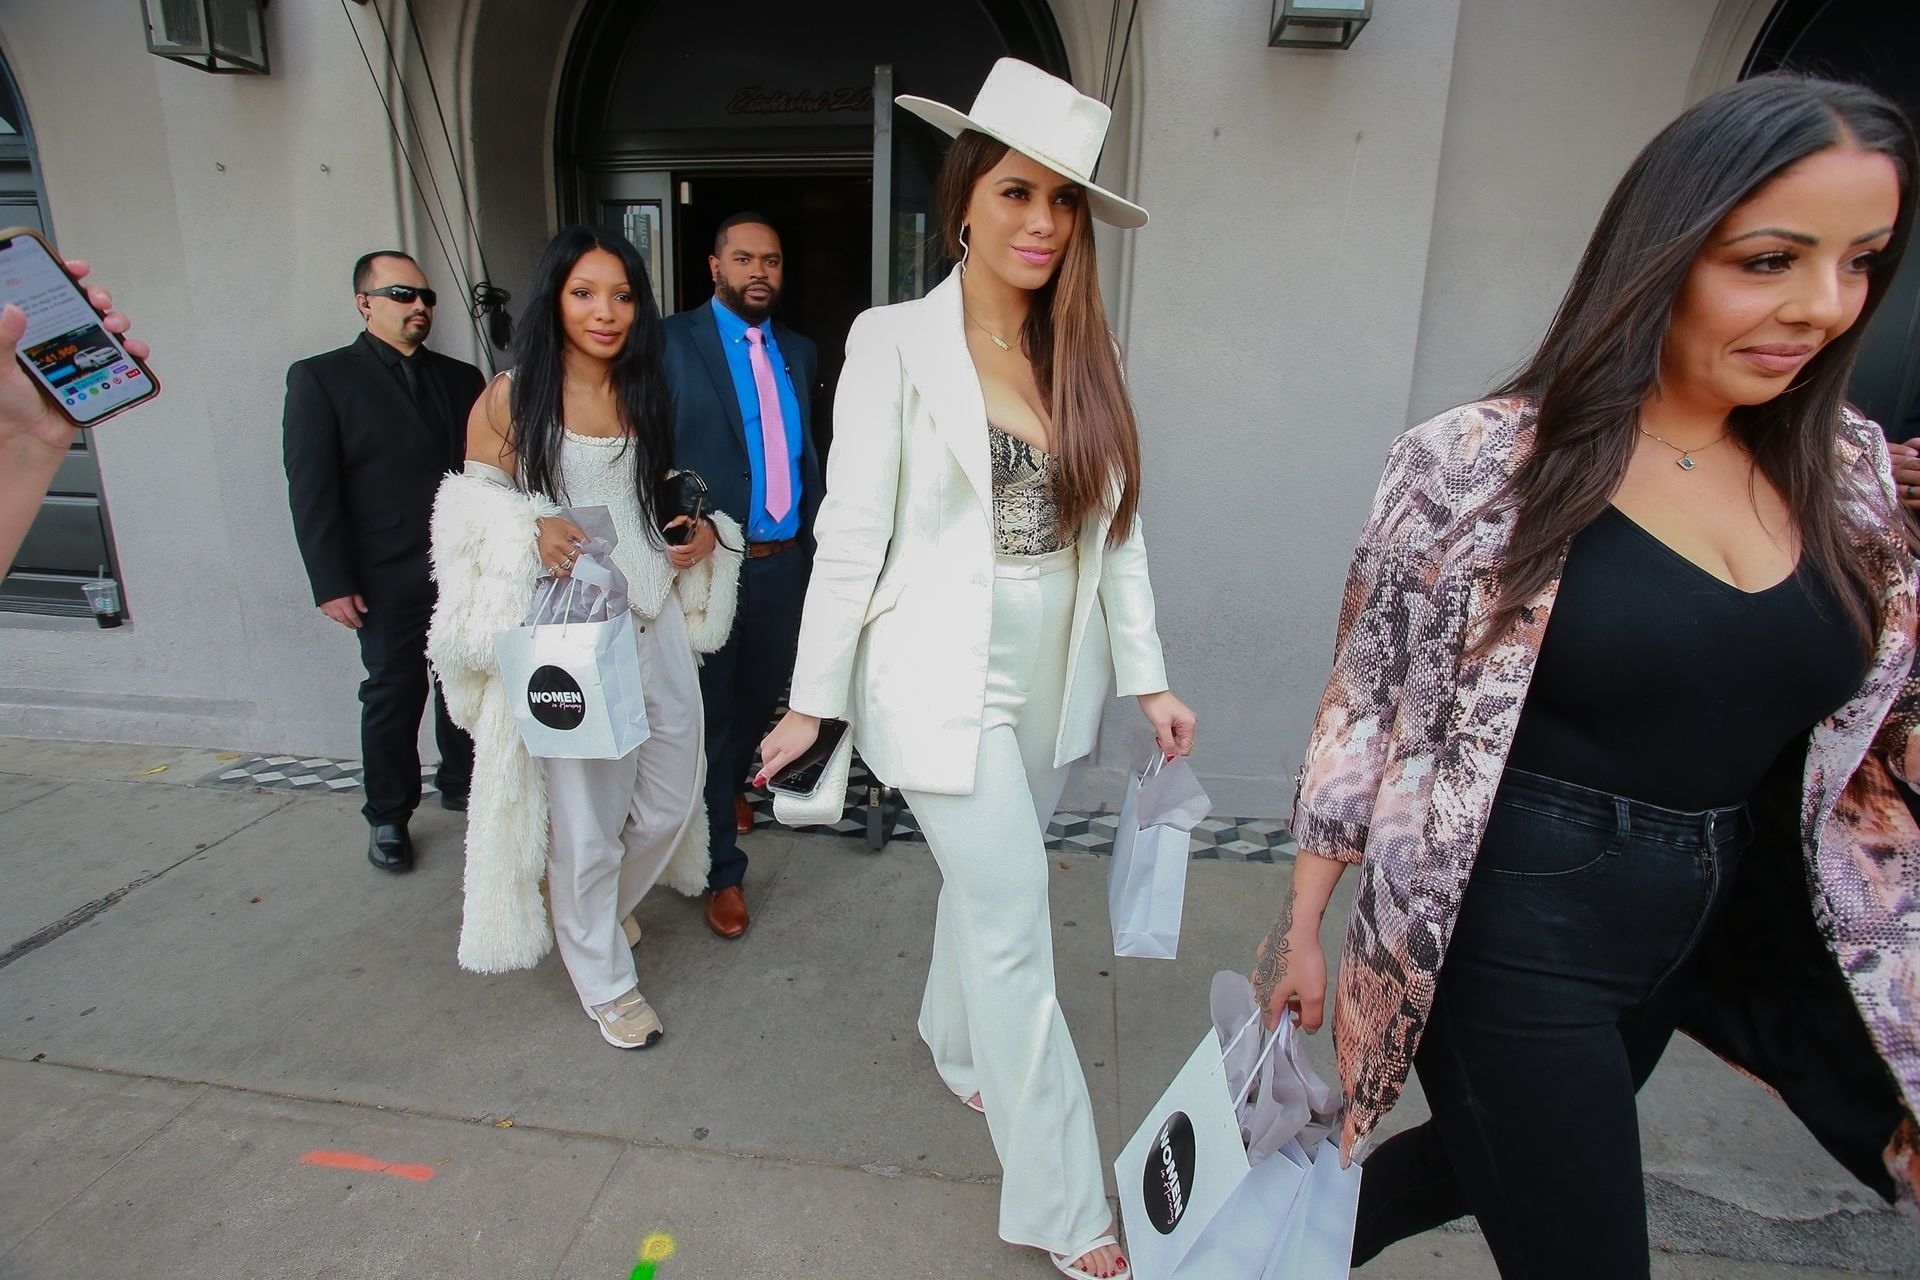 Dinah Jane Departs The Women In Harmony Pre Grammy Luncheon 0015